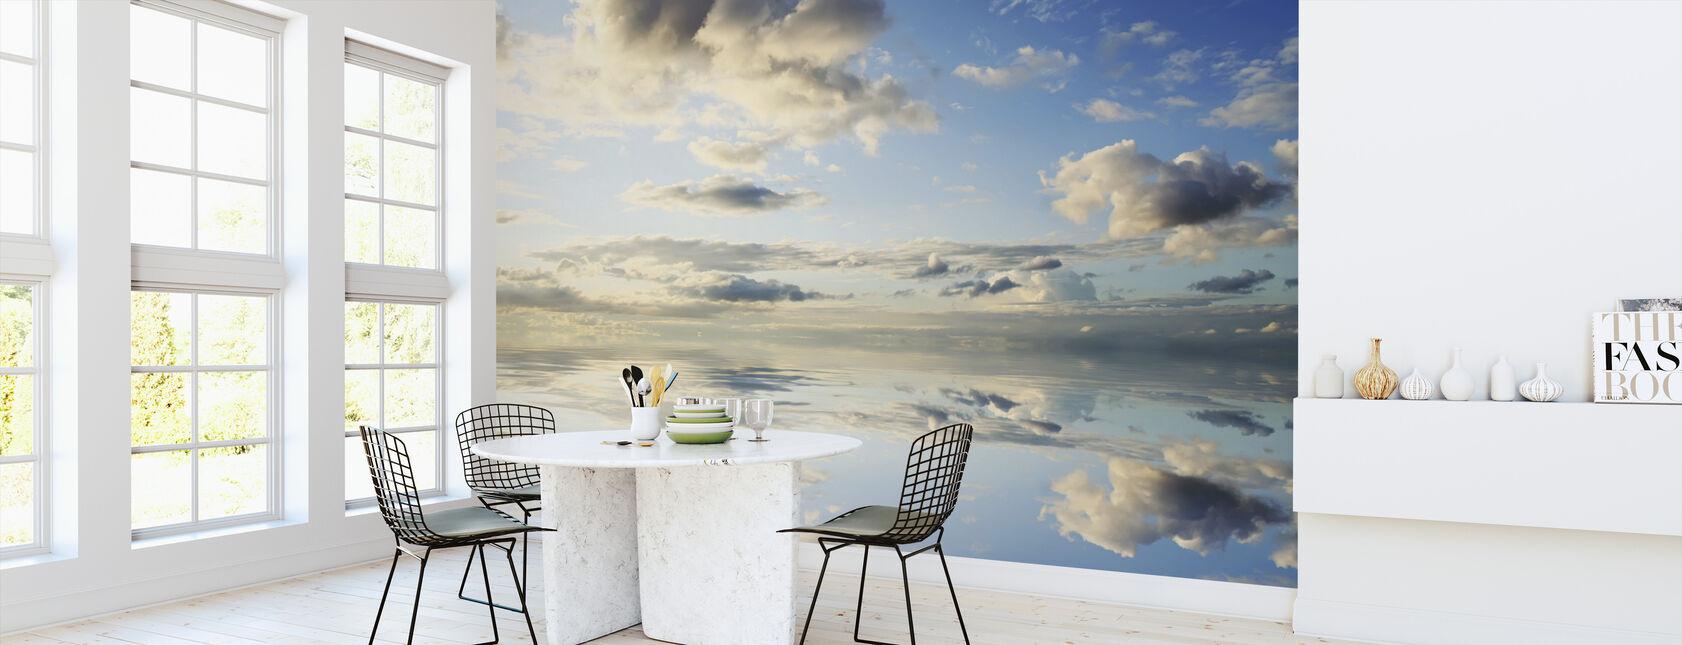 Mare e cielo bellissimo - Carta da parati - Cucina